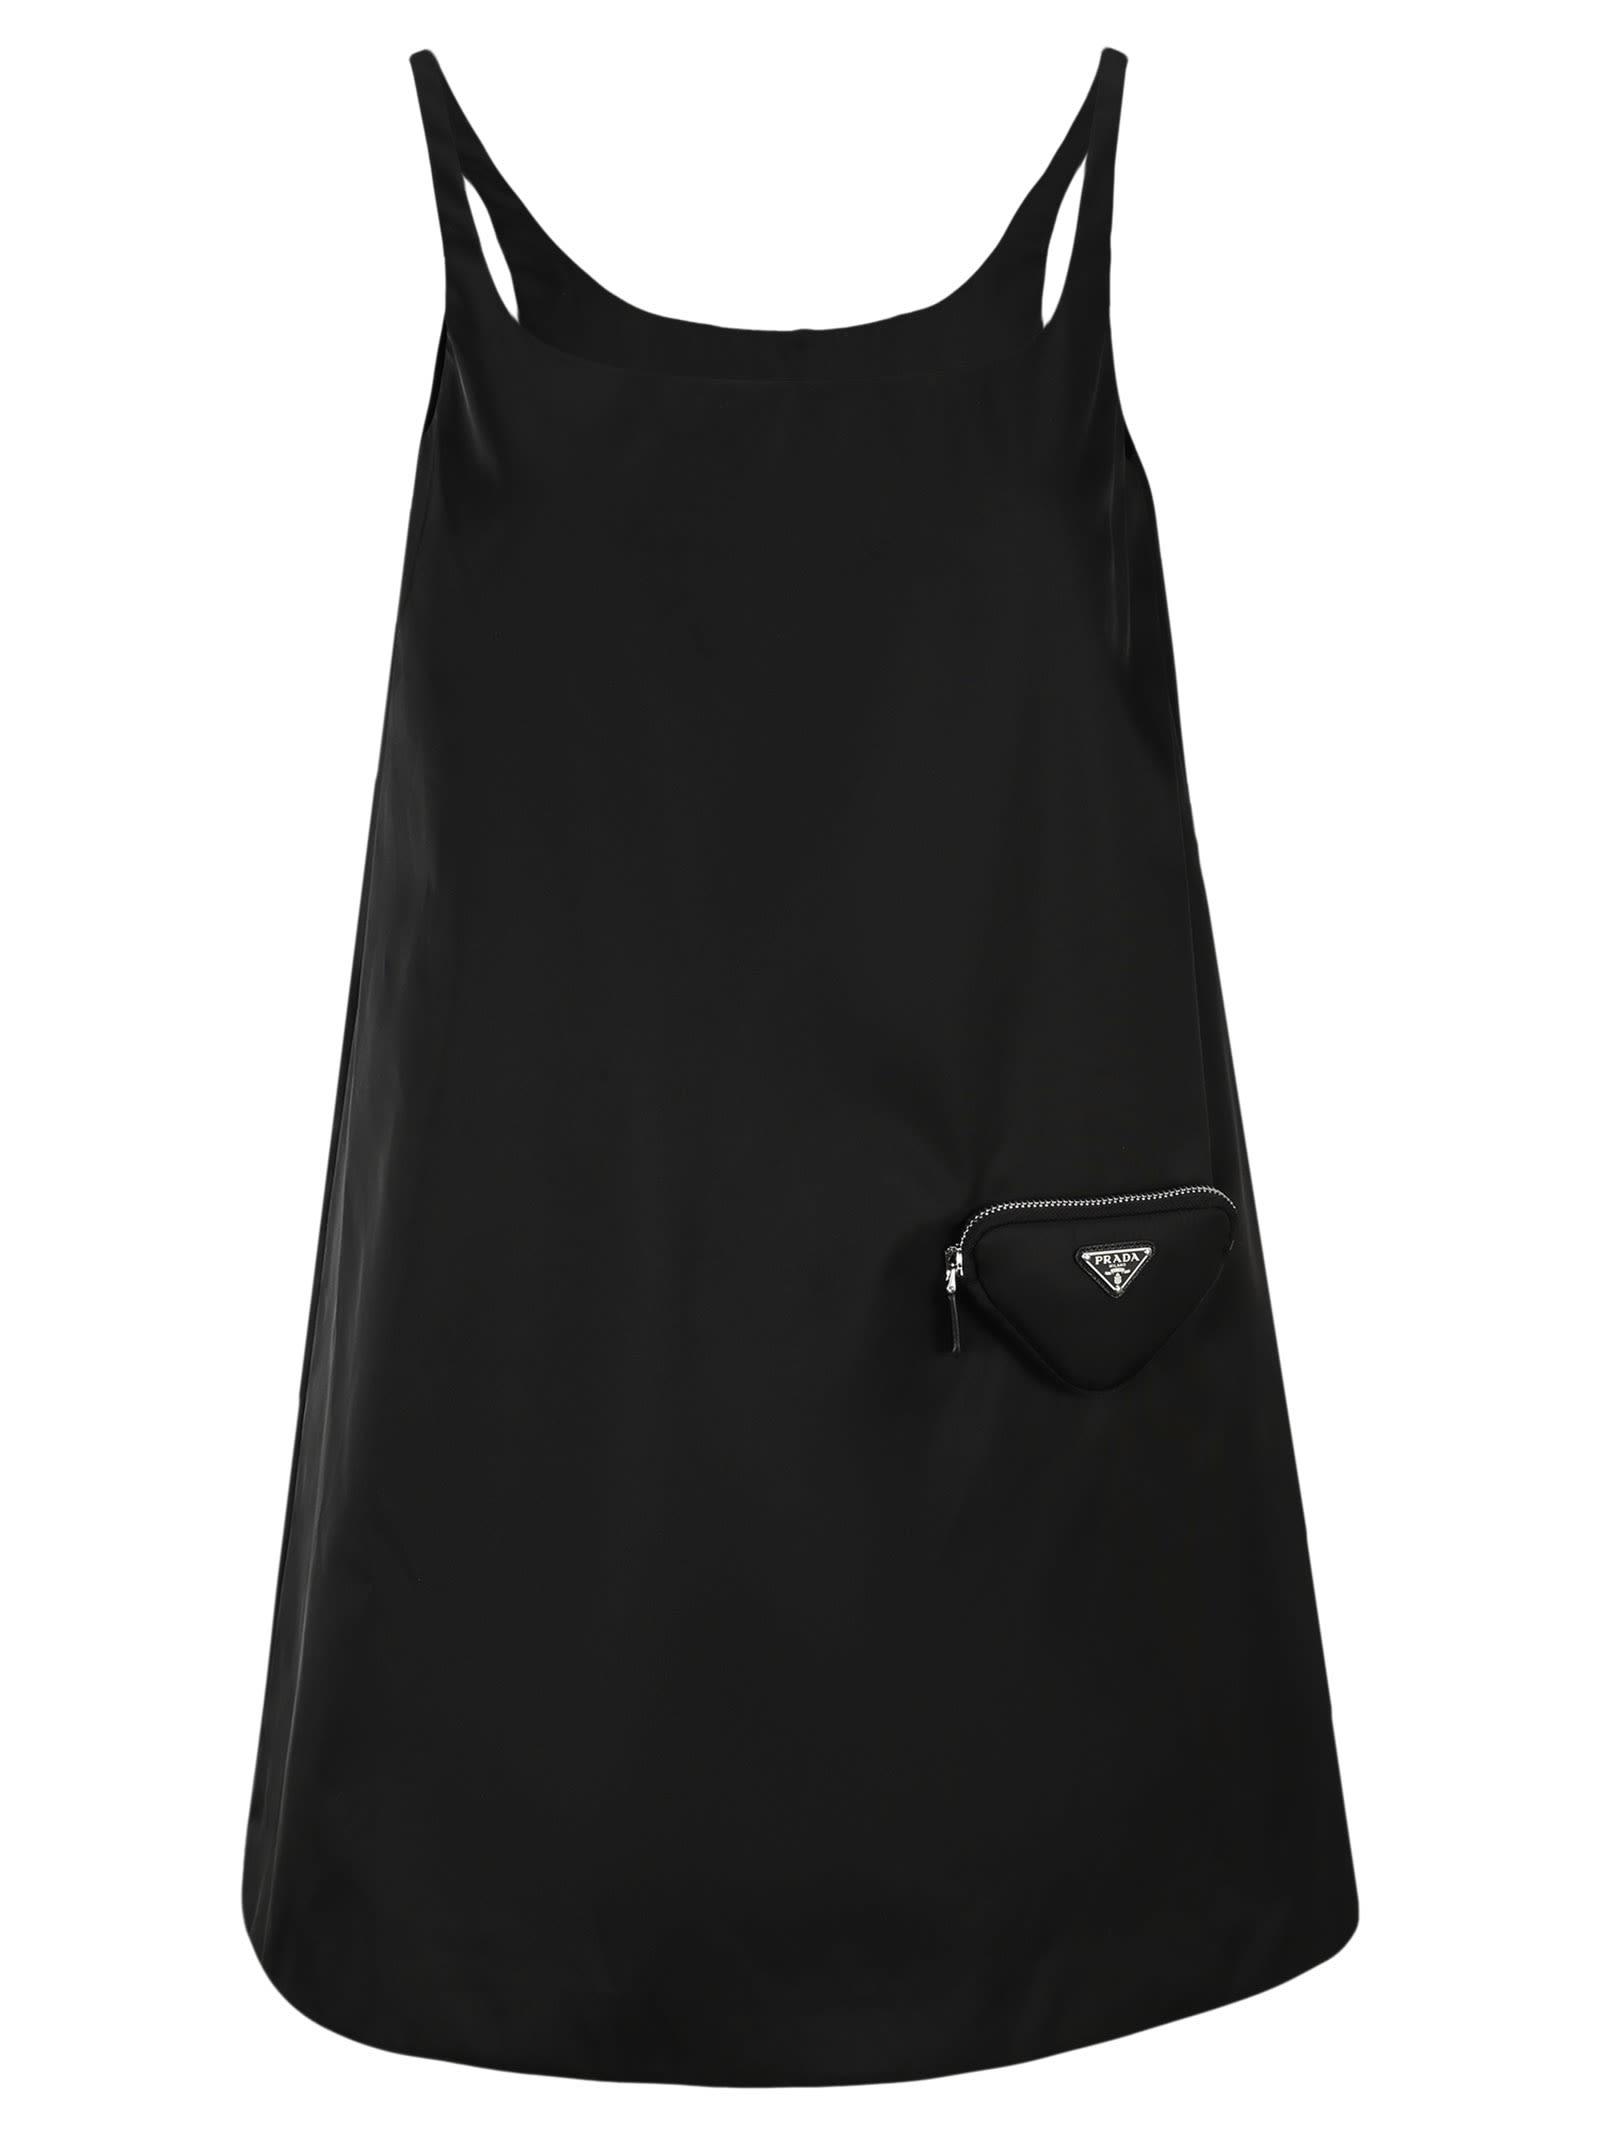 Prada Re-nylon Sleeveless Dress With Pouch